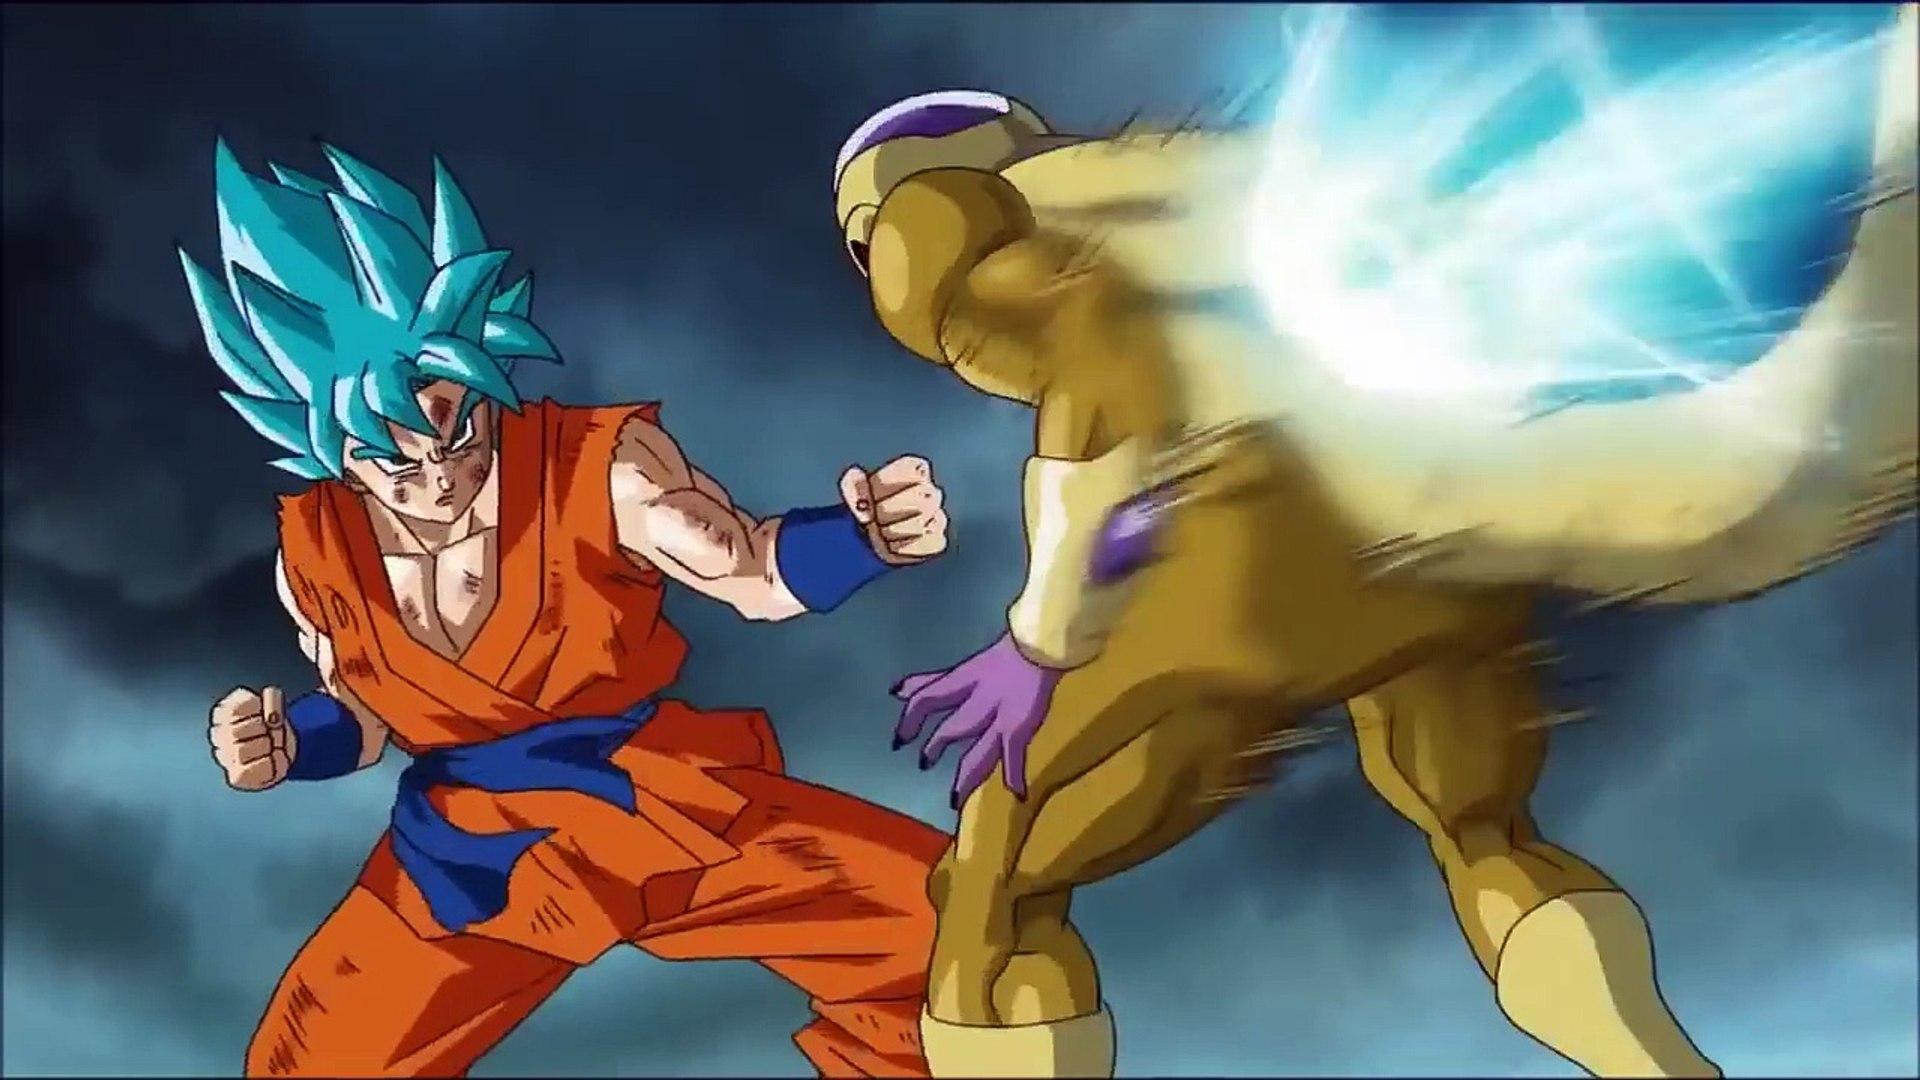 Goku vs golden frieza dragon ball super chinatown golden dragon parade 2015